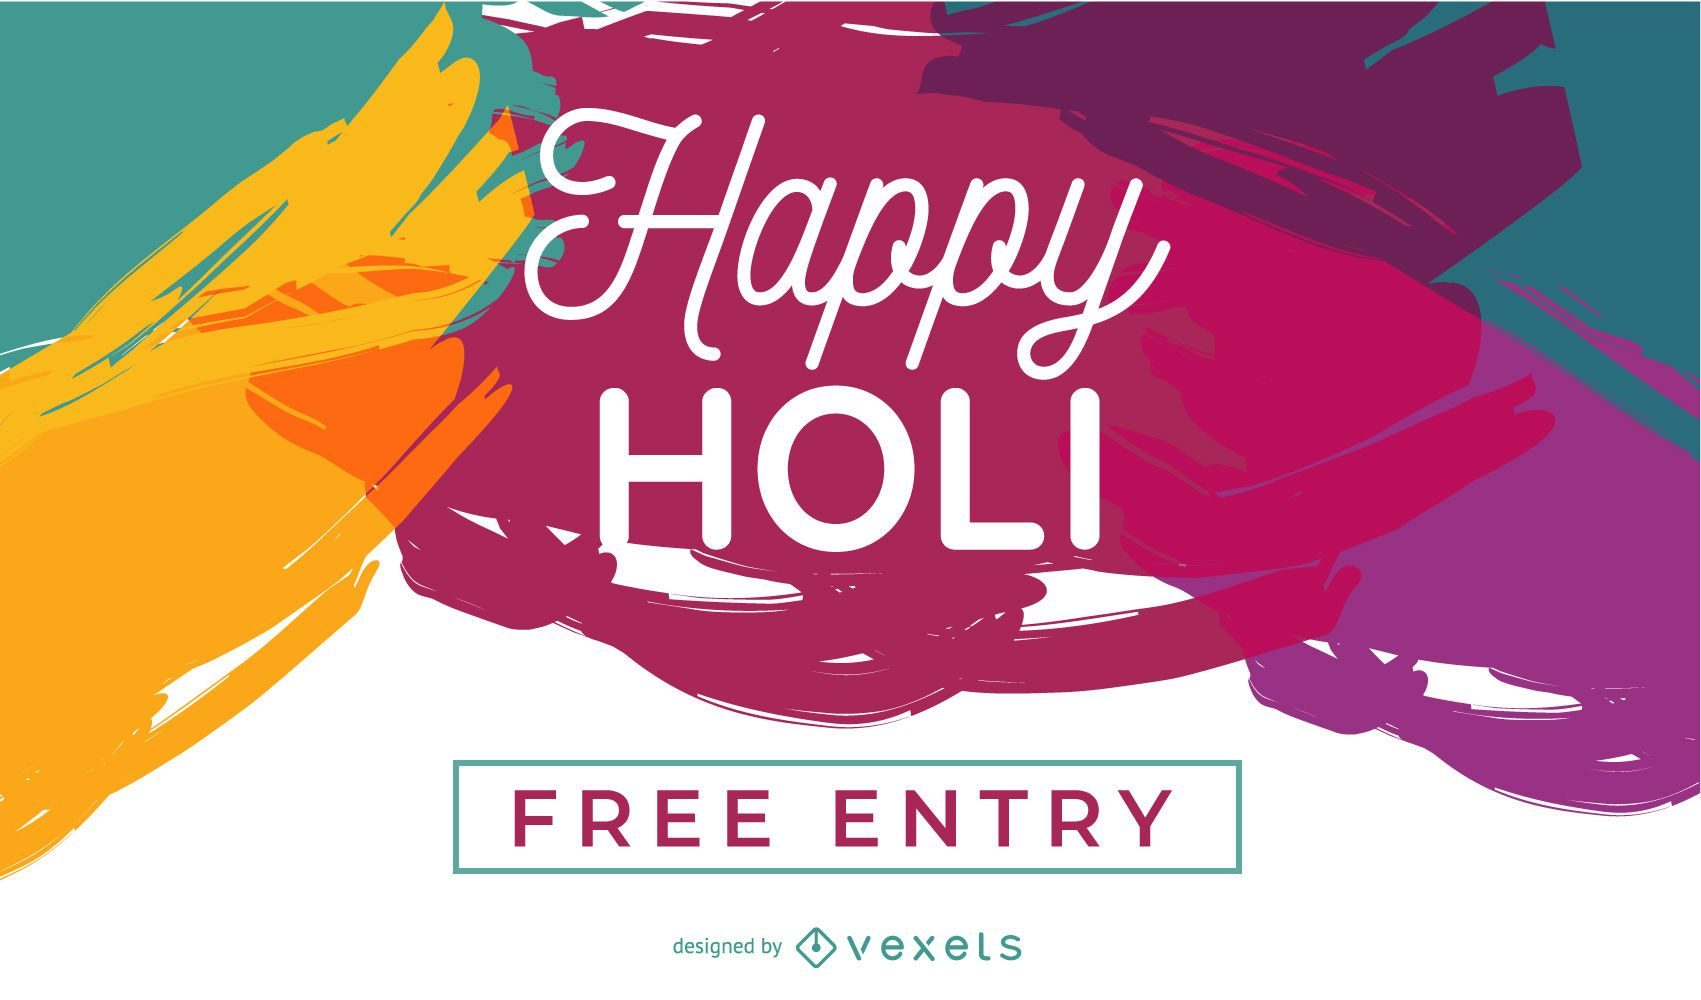 Happy Holi Poster Design